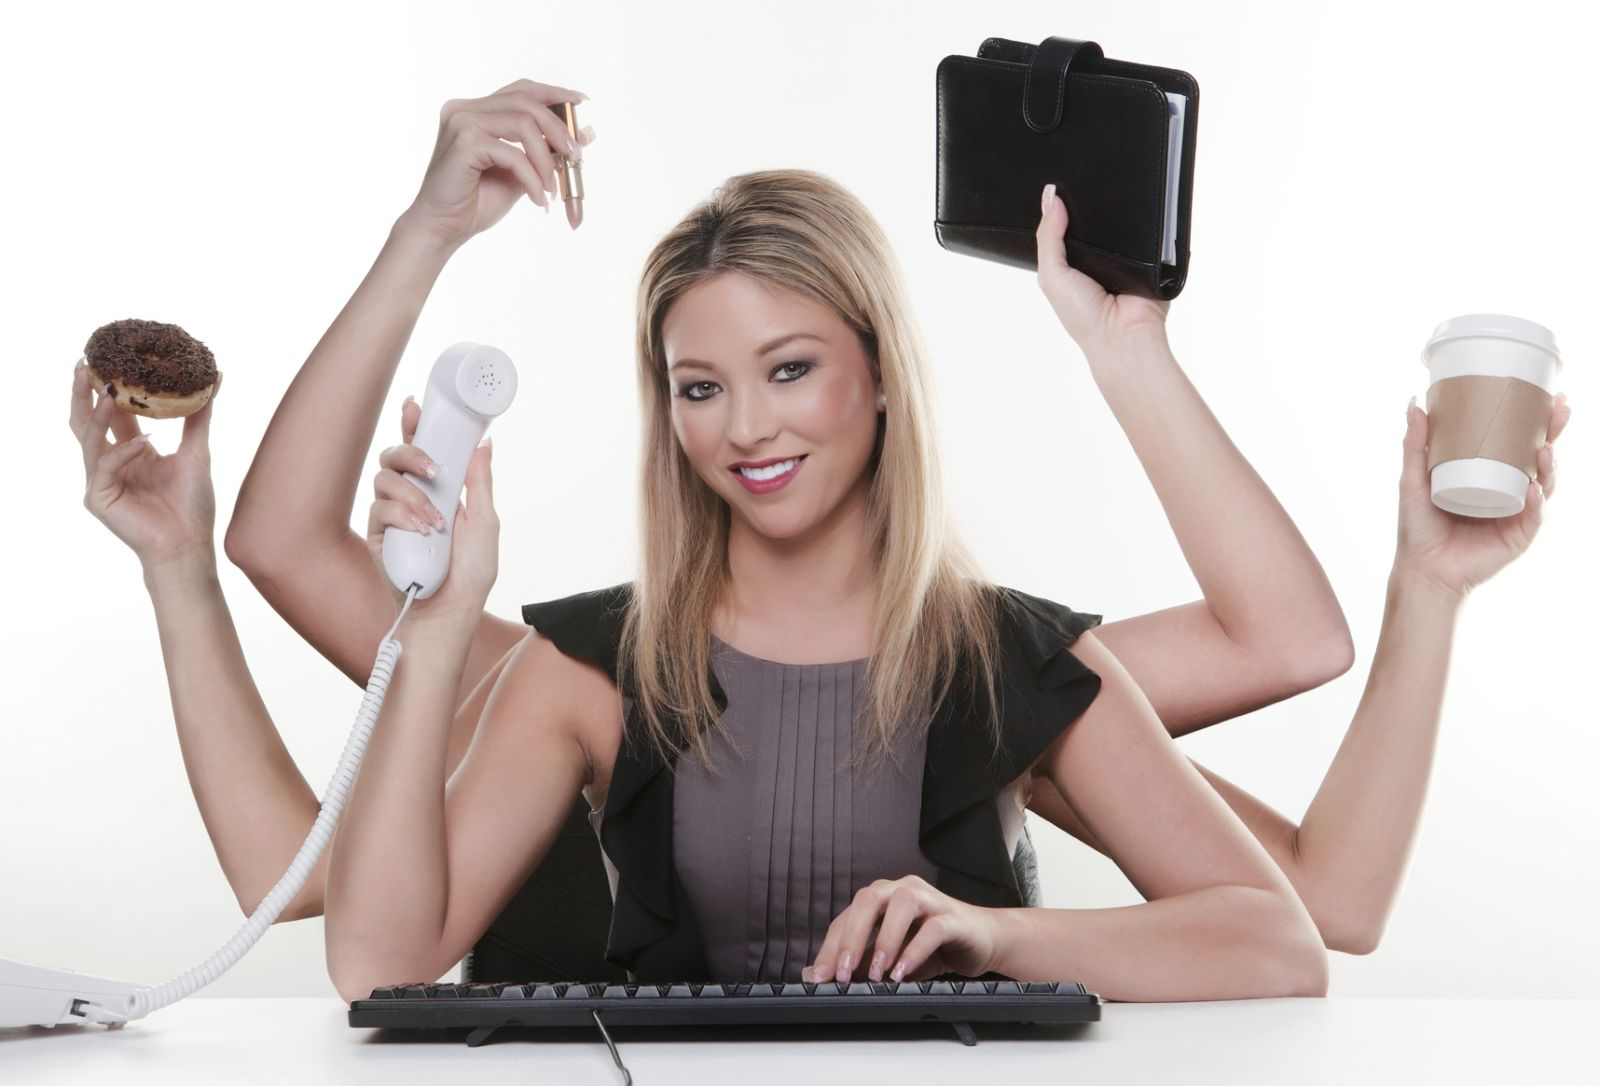 Девочка секретарь секс